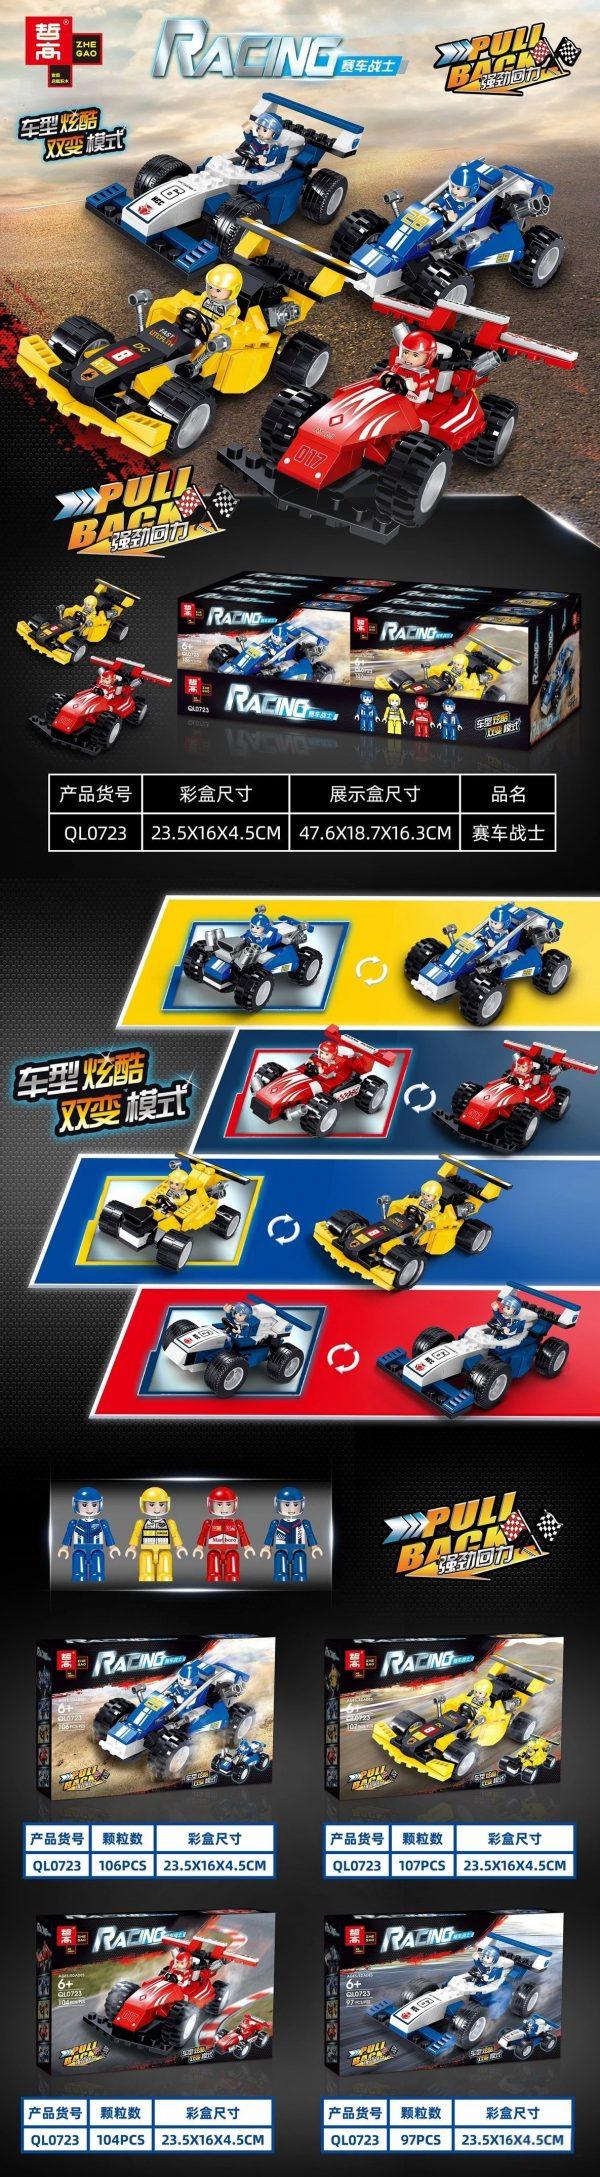 ZHEGAO QL0723 Racing Cars Warrior: Formula 1 Racing Cars 4 0